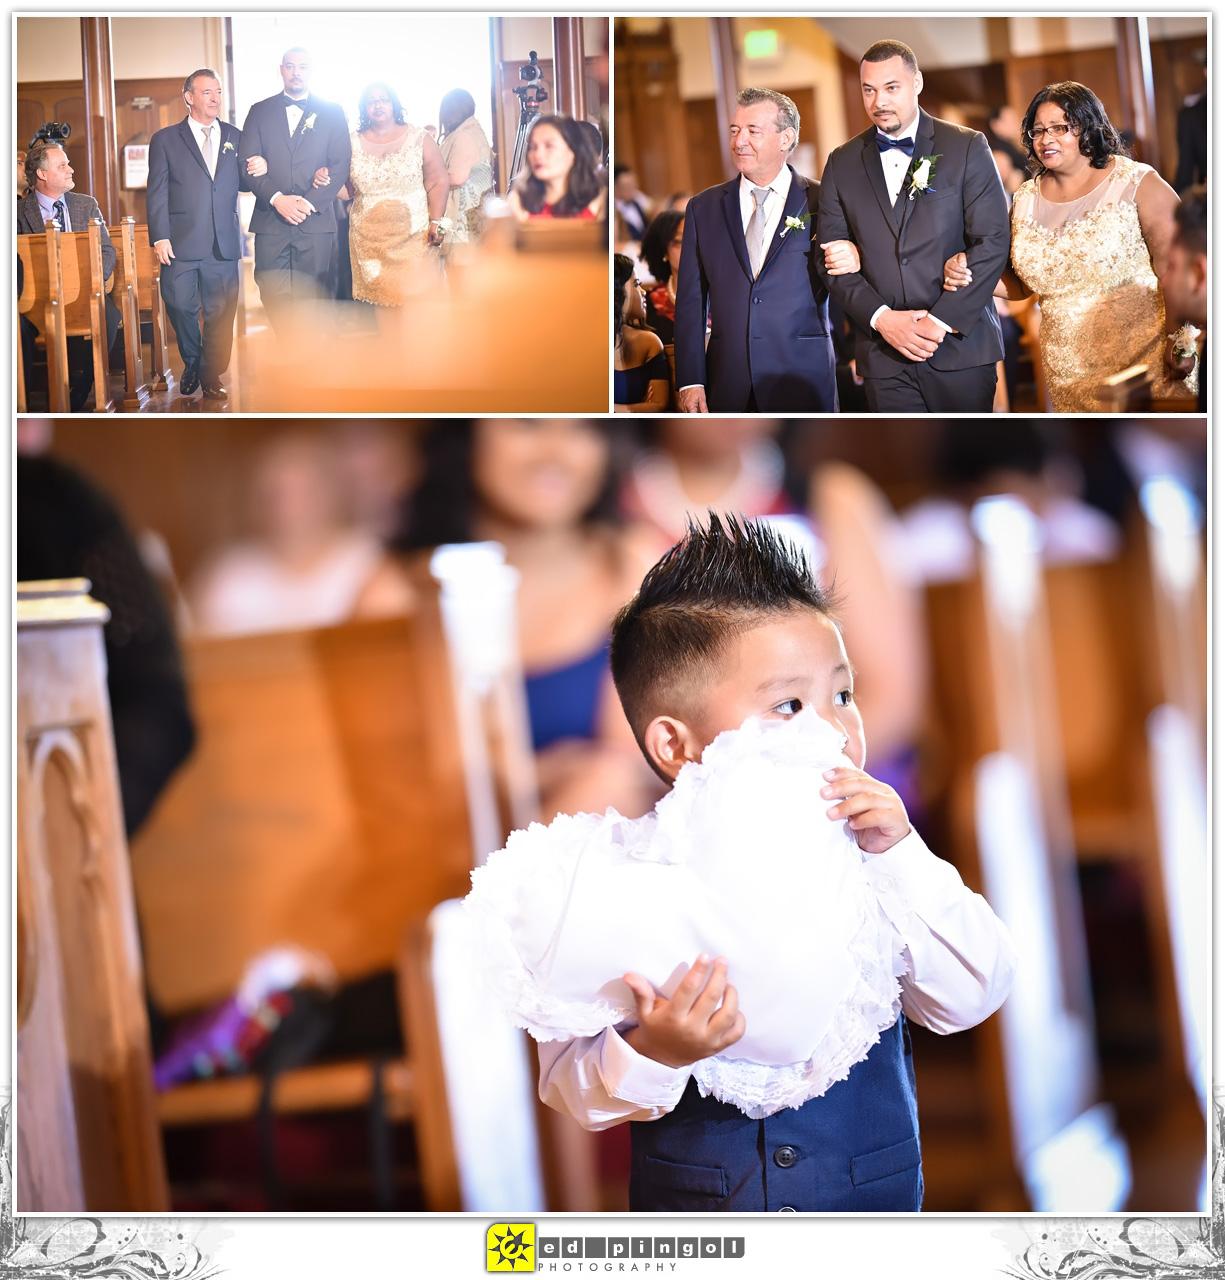 EDs TEASERS Chris and Allison Wedding 186045.JPG